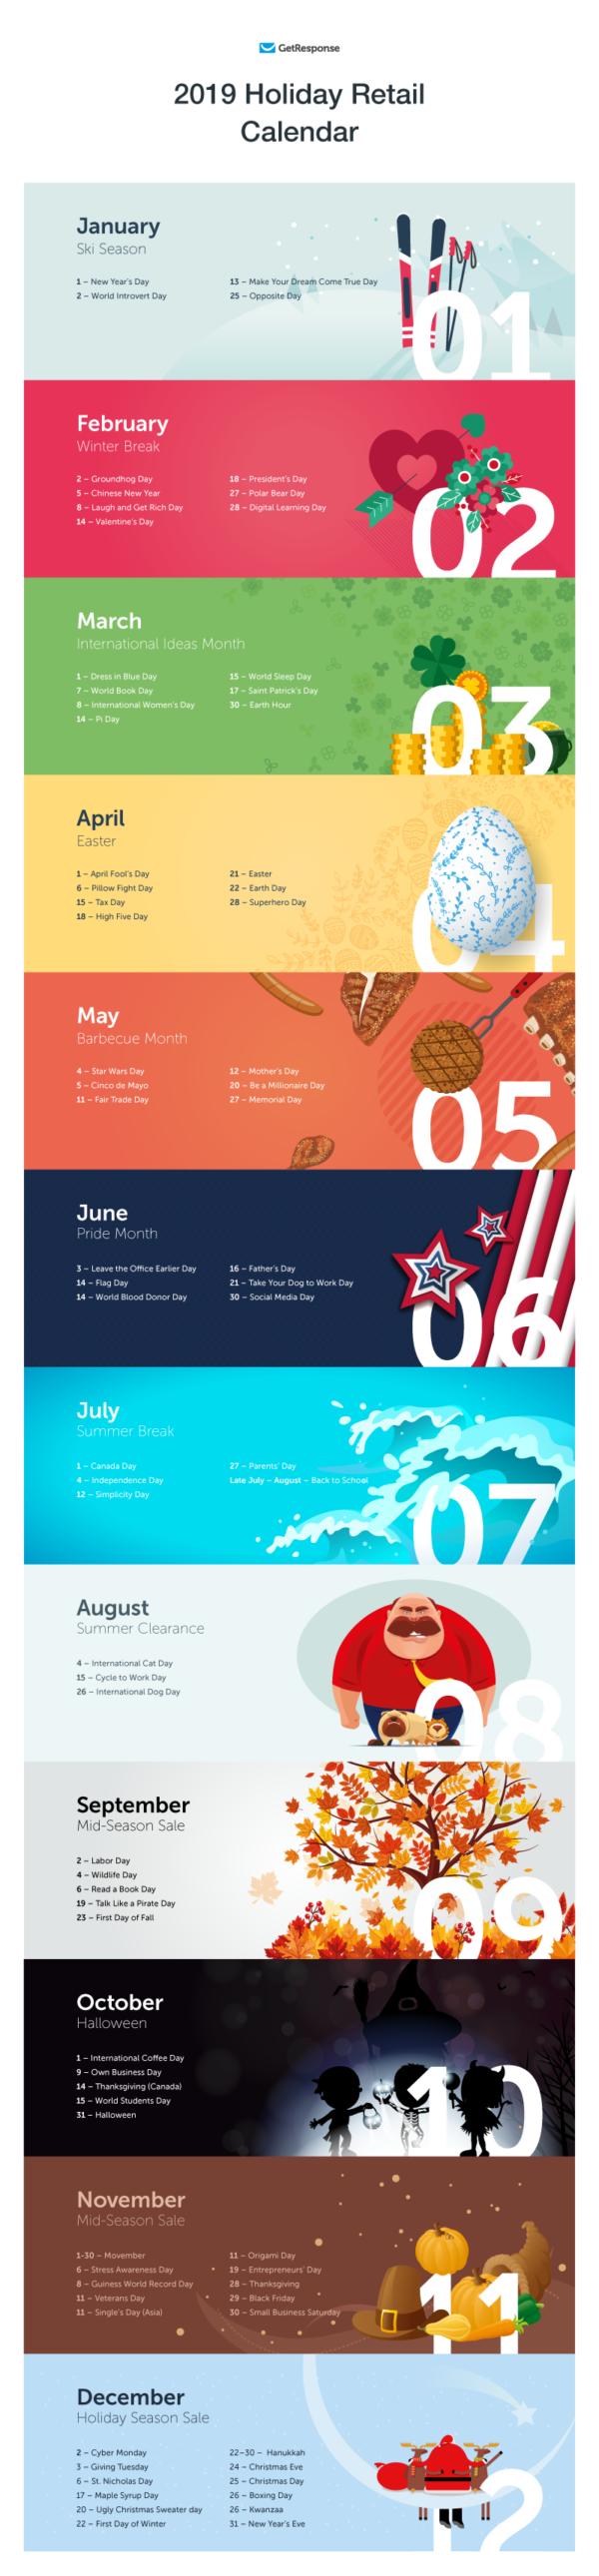 holiday-retail-calendar